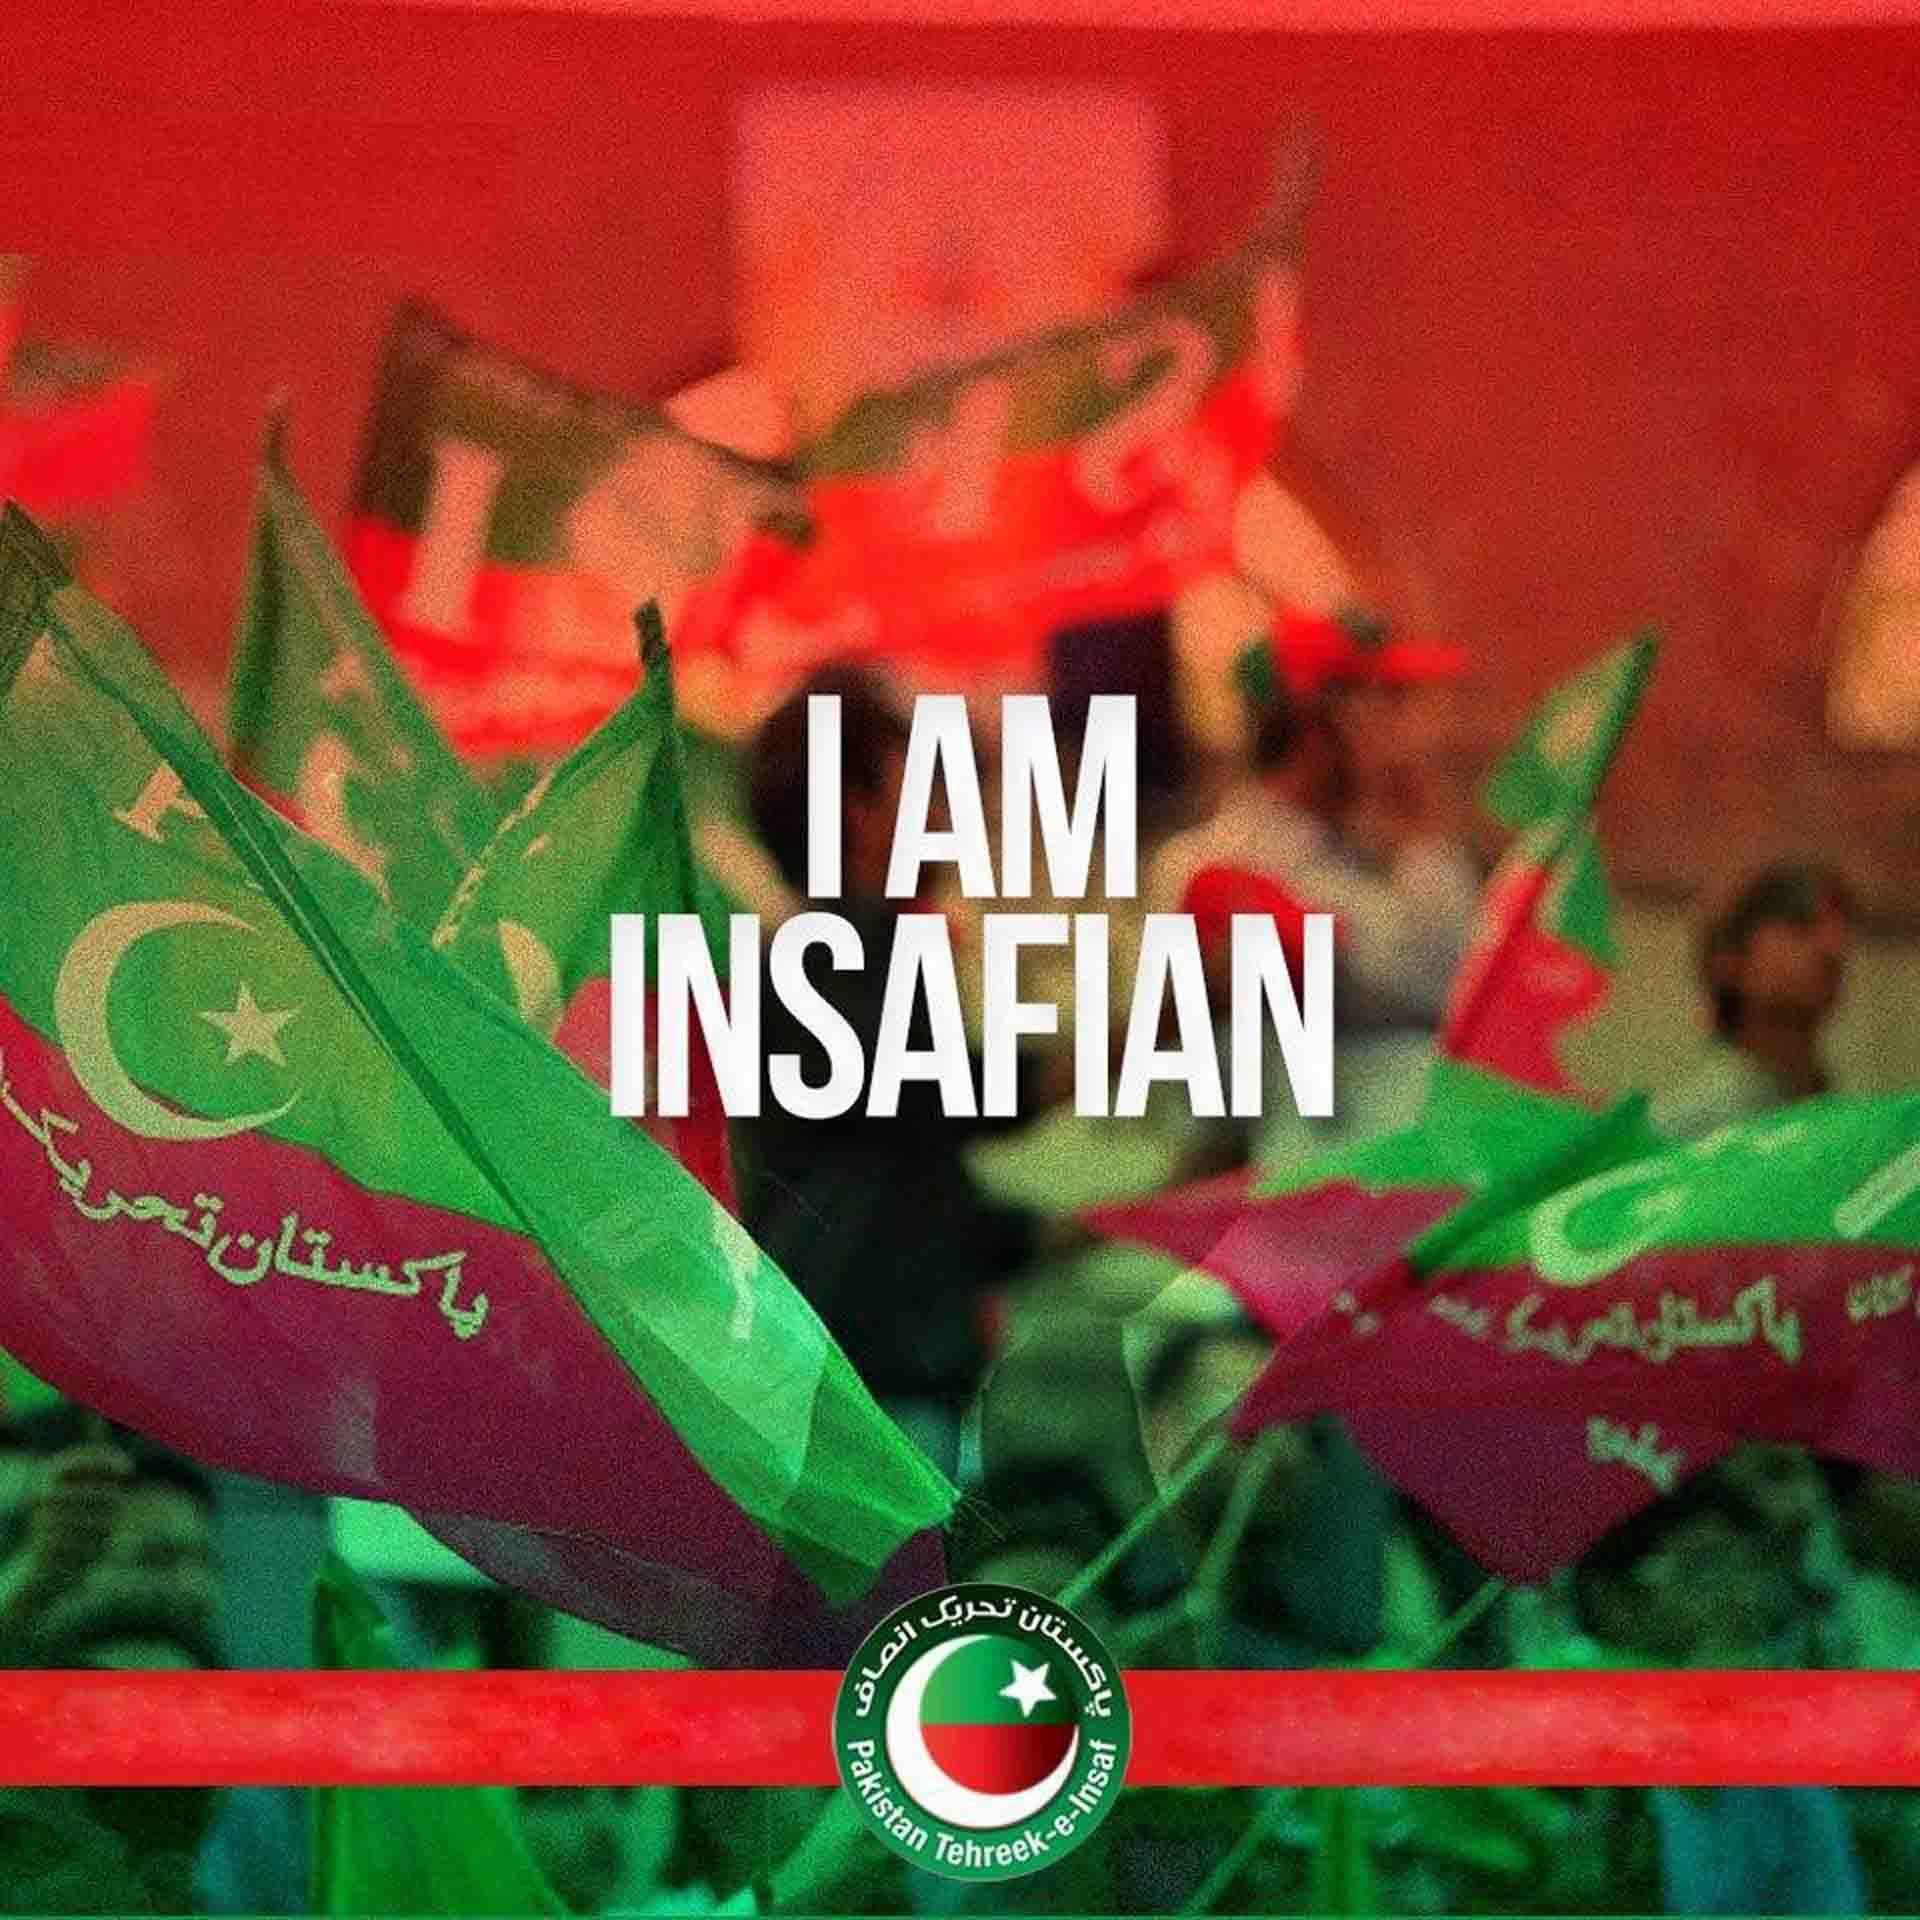 Imran Kahn I Am A Rider Songs Download: Pakistan Tehreek Insaf Latest HD Wallpapers Free Download